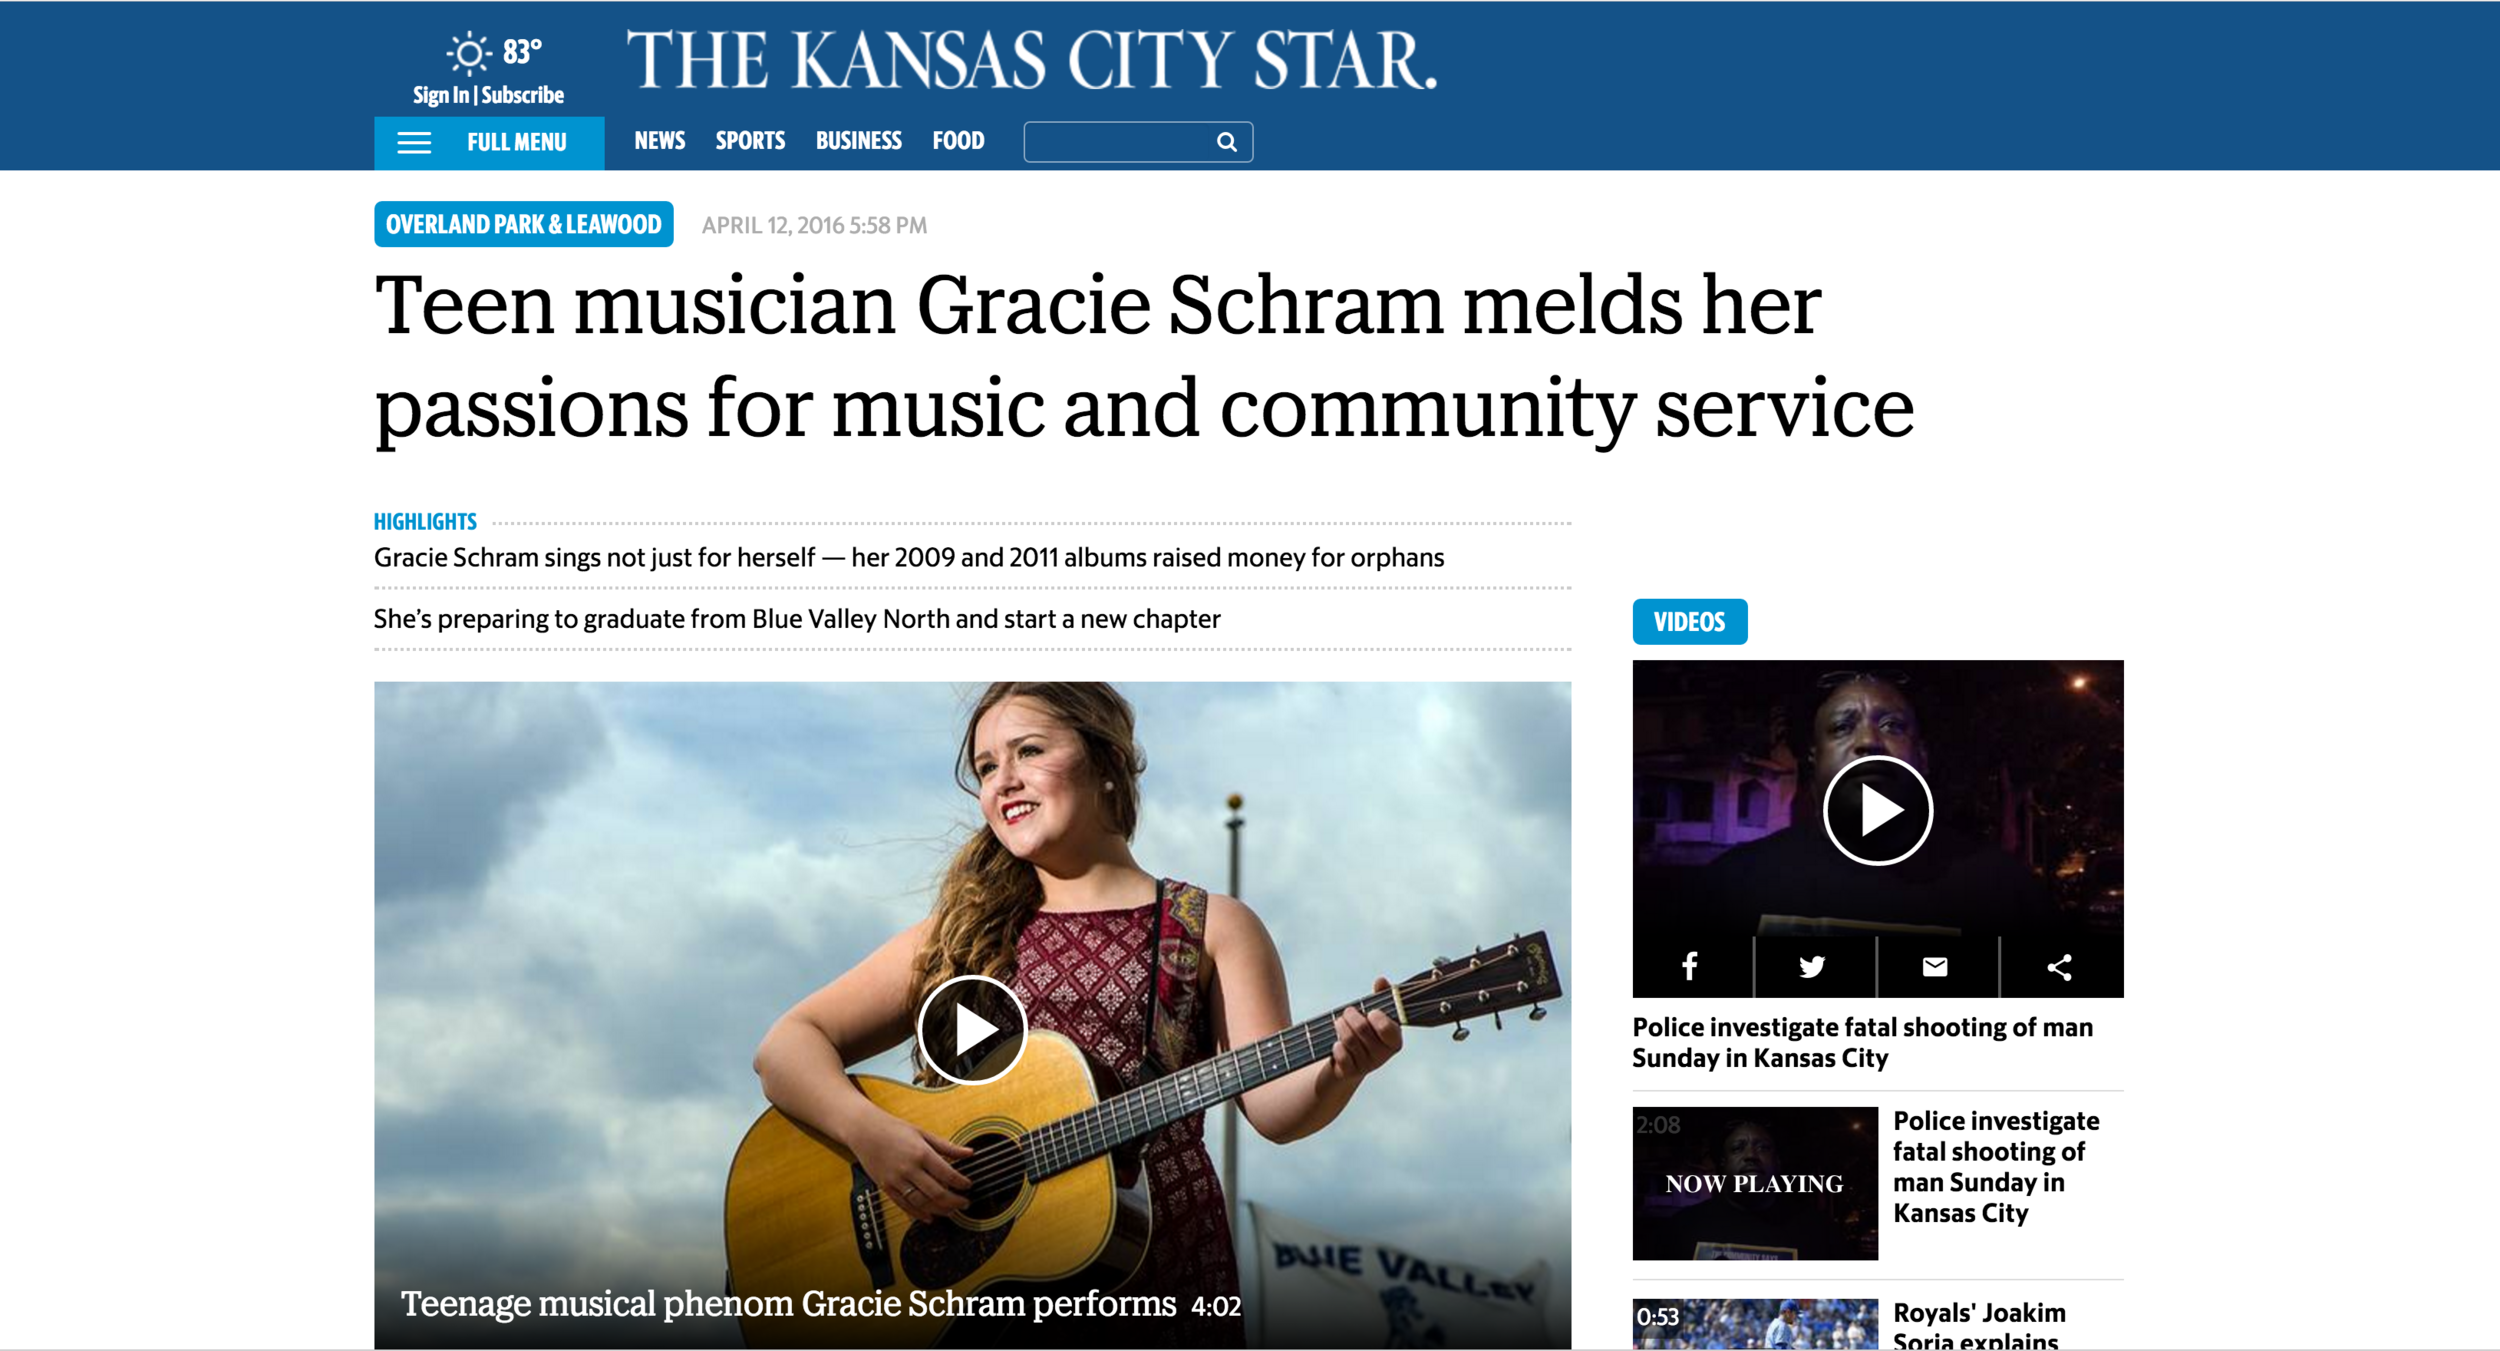 Gracie-Schram-Kansas-City-Star.png